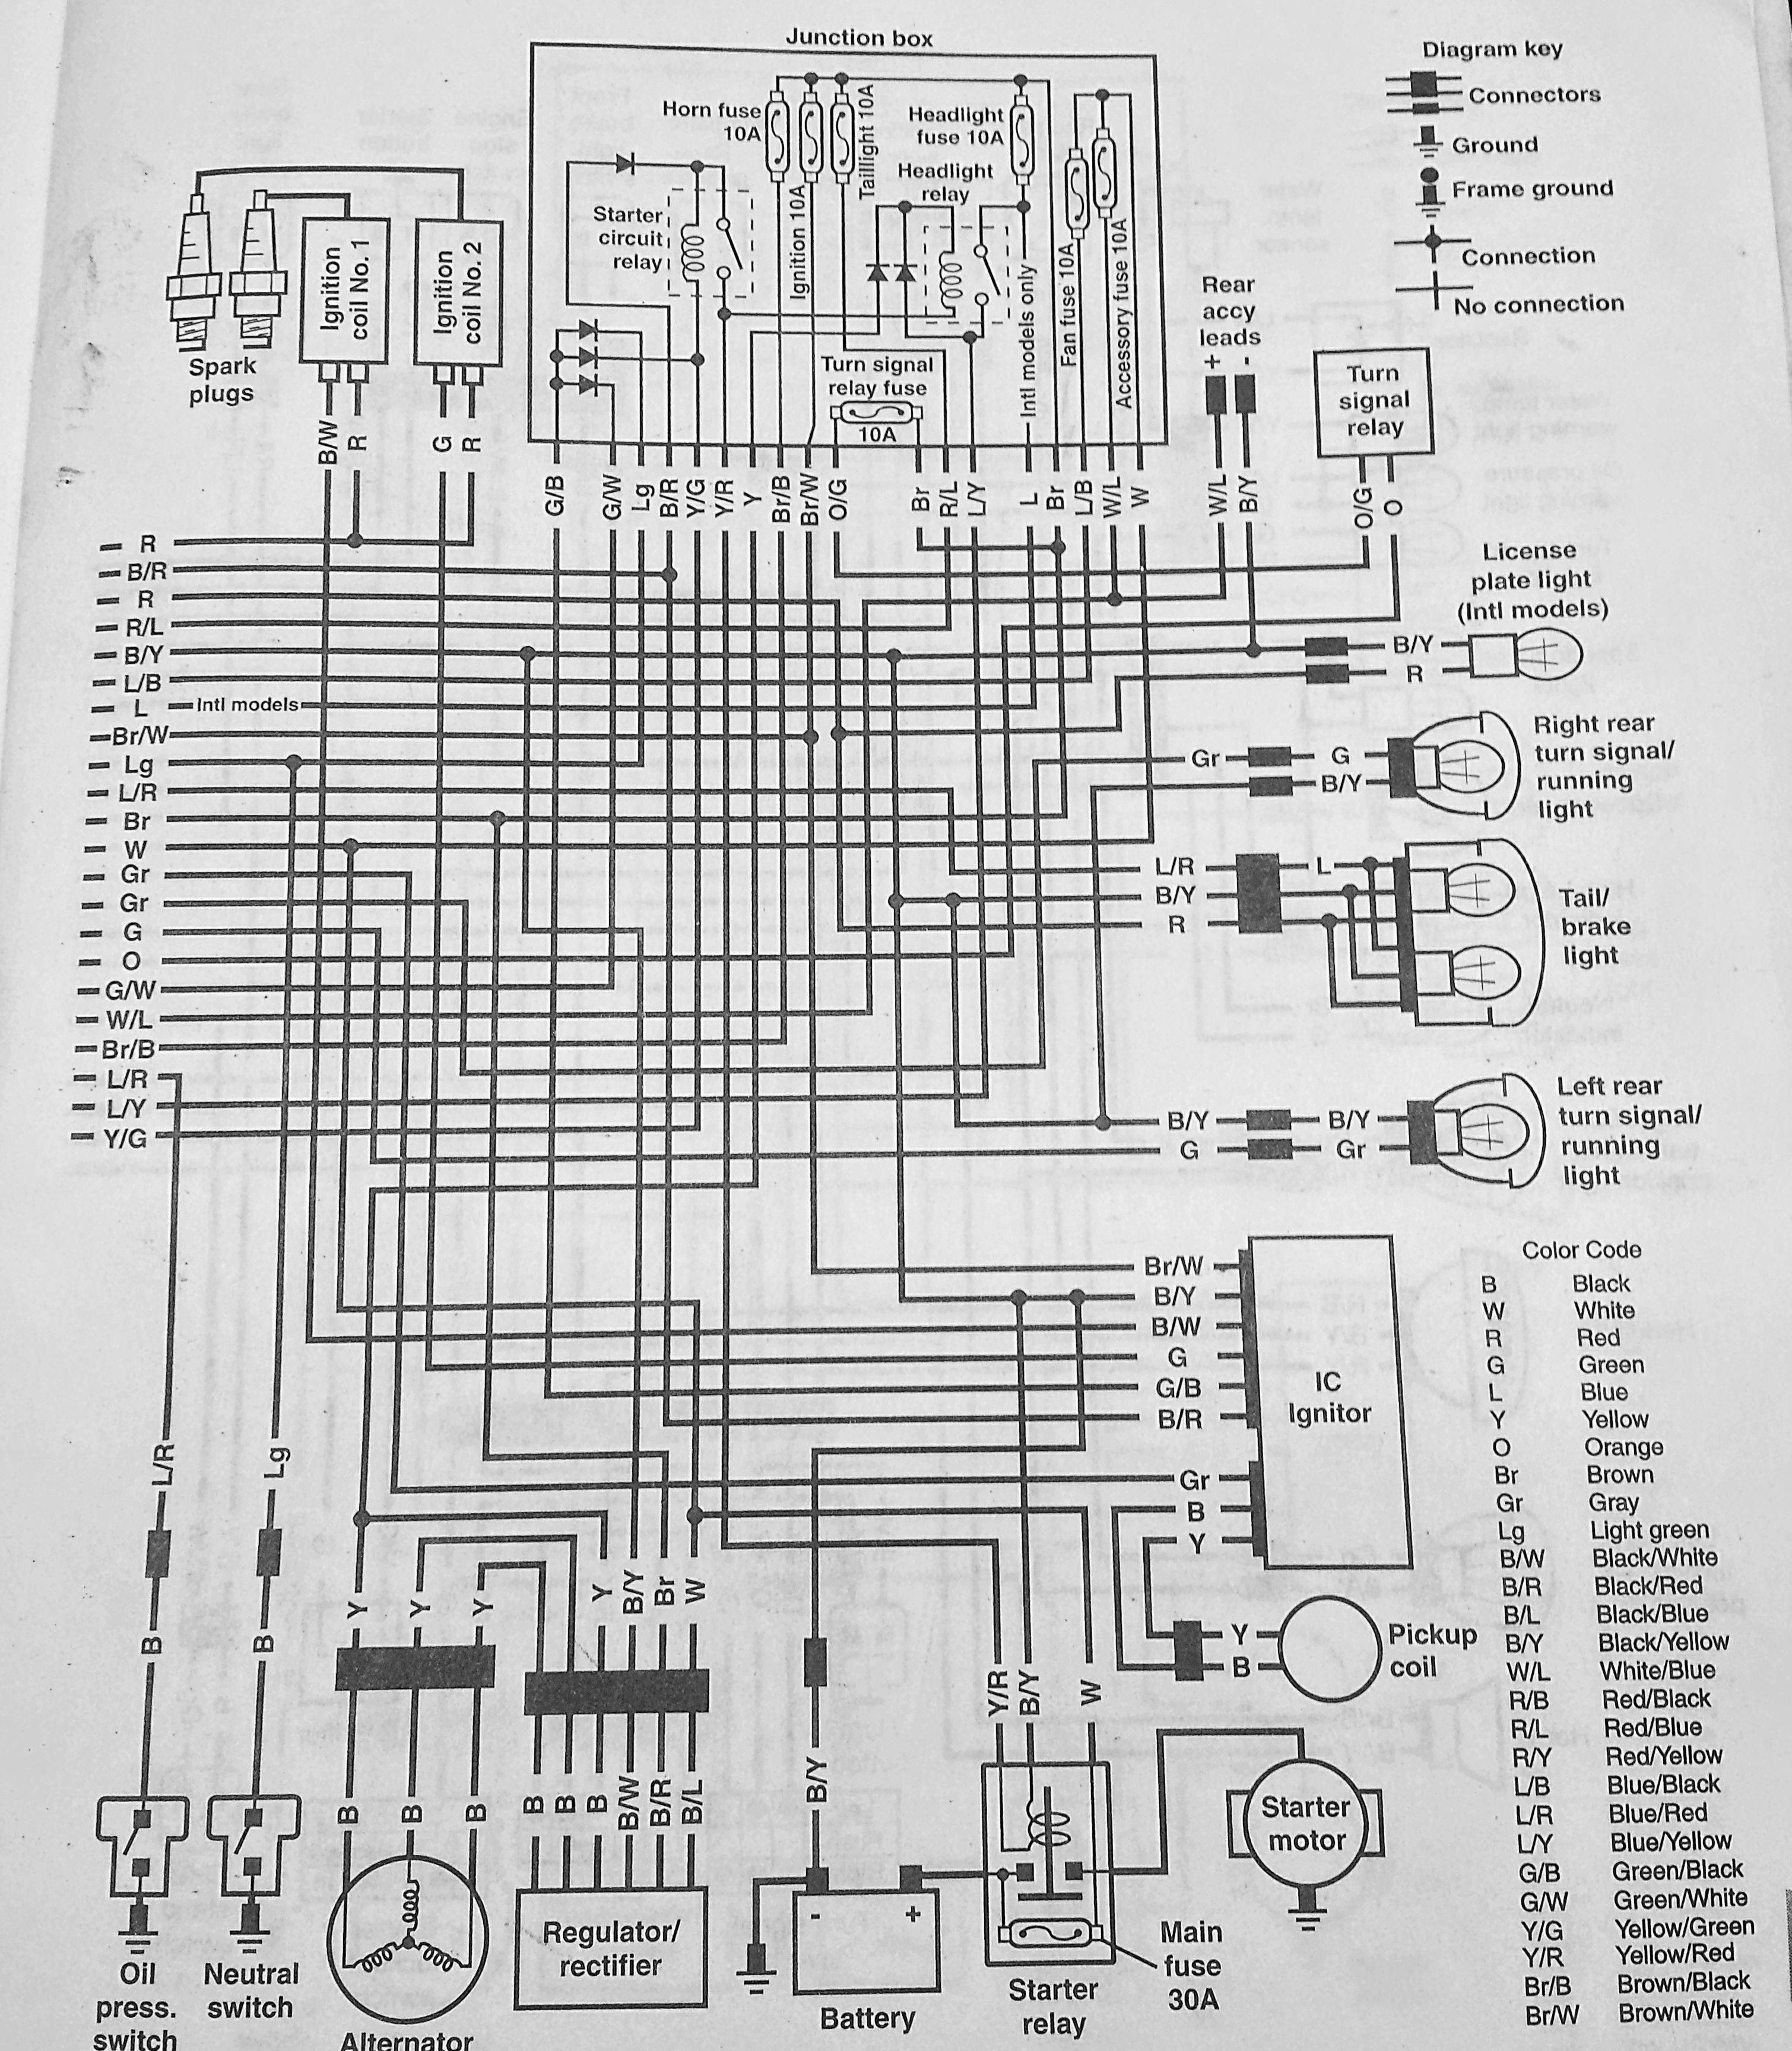 Fine Kawasaki Vulcan Drifter 1500 Wiring Diagram Wiring Diagram Data Schema Wiring Cloud Filiciilluminateatxorg